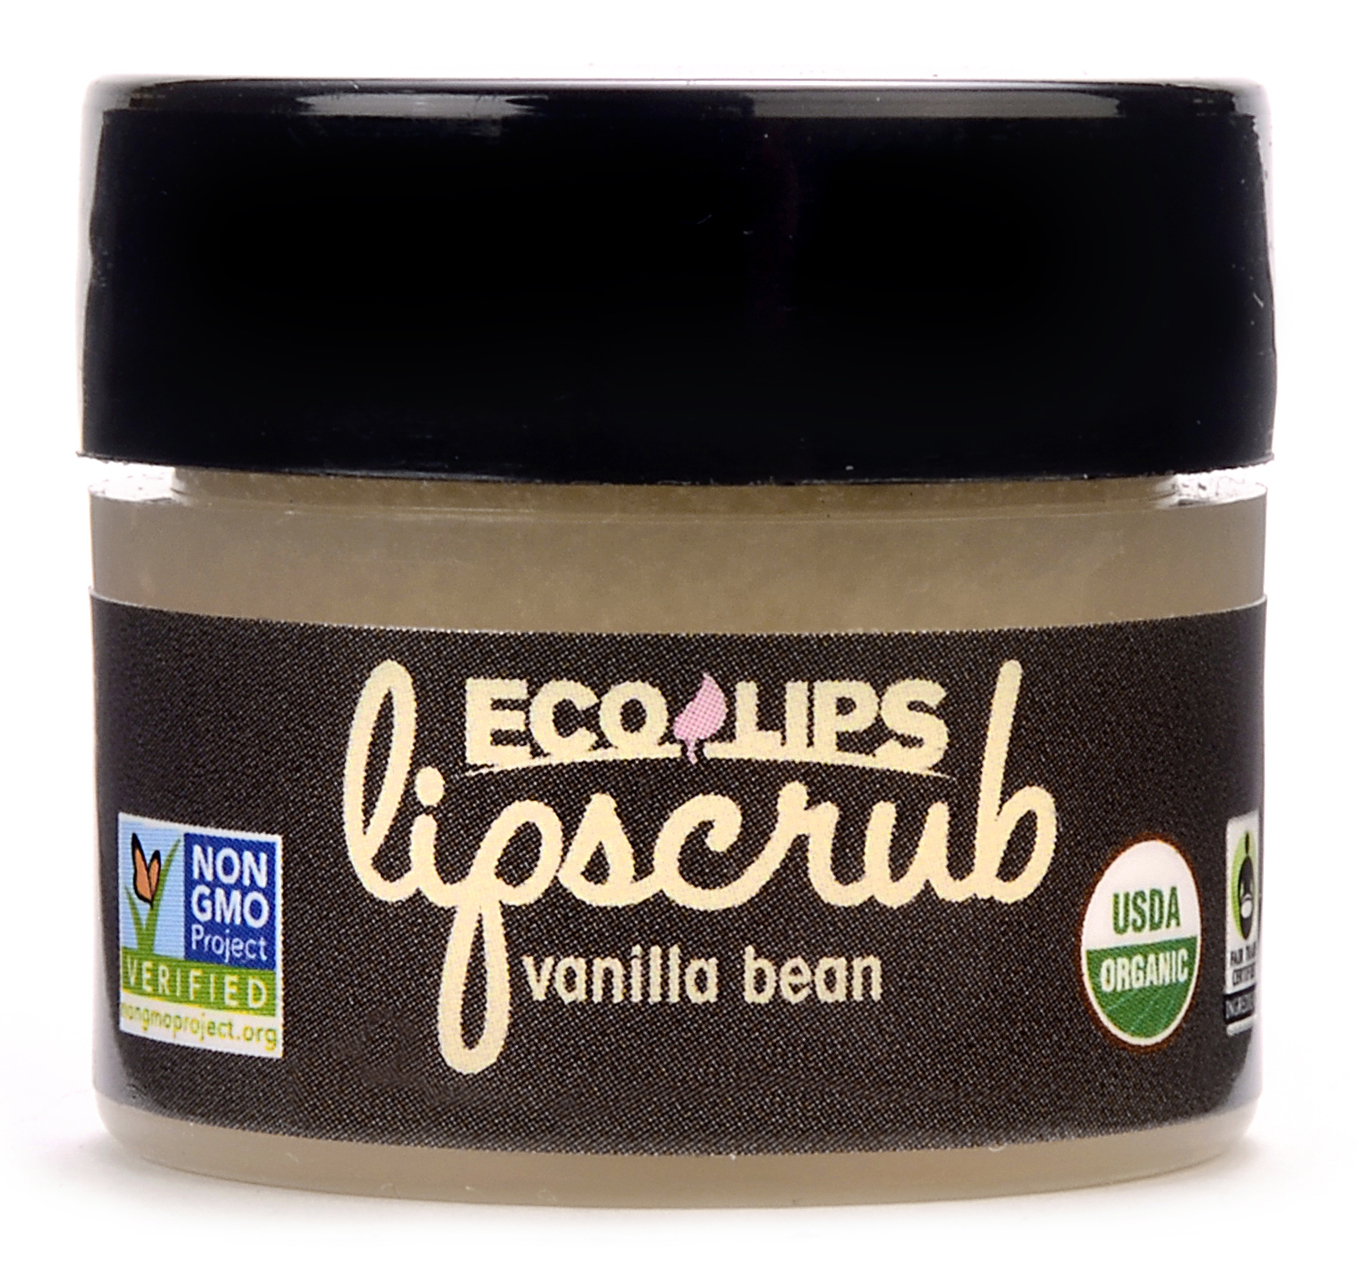 Walmart.com - Eco Lips Sugar Lip Scrub, Vanilla Bean - Walmart.com